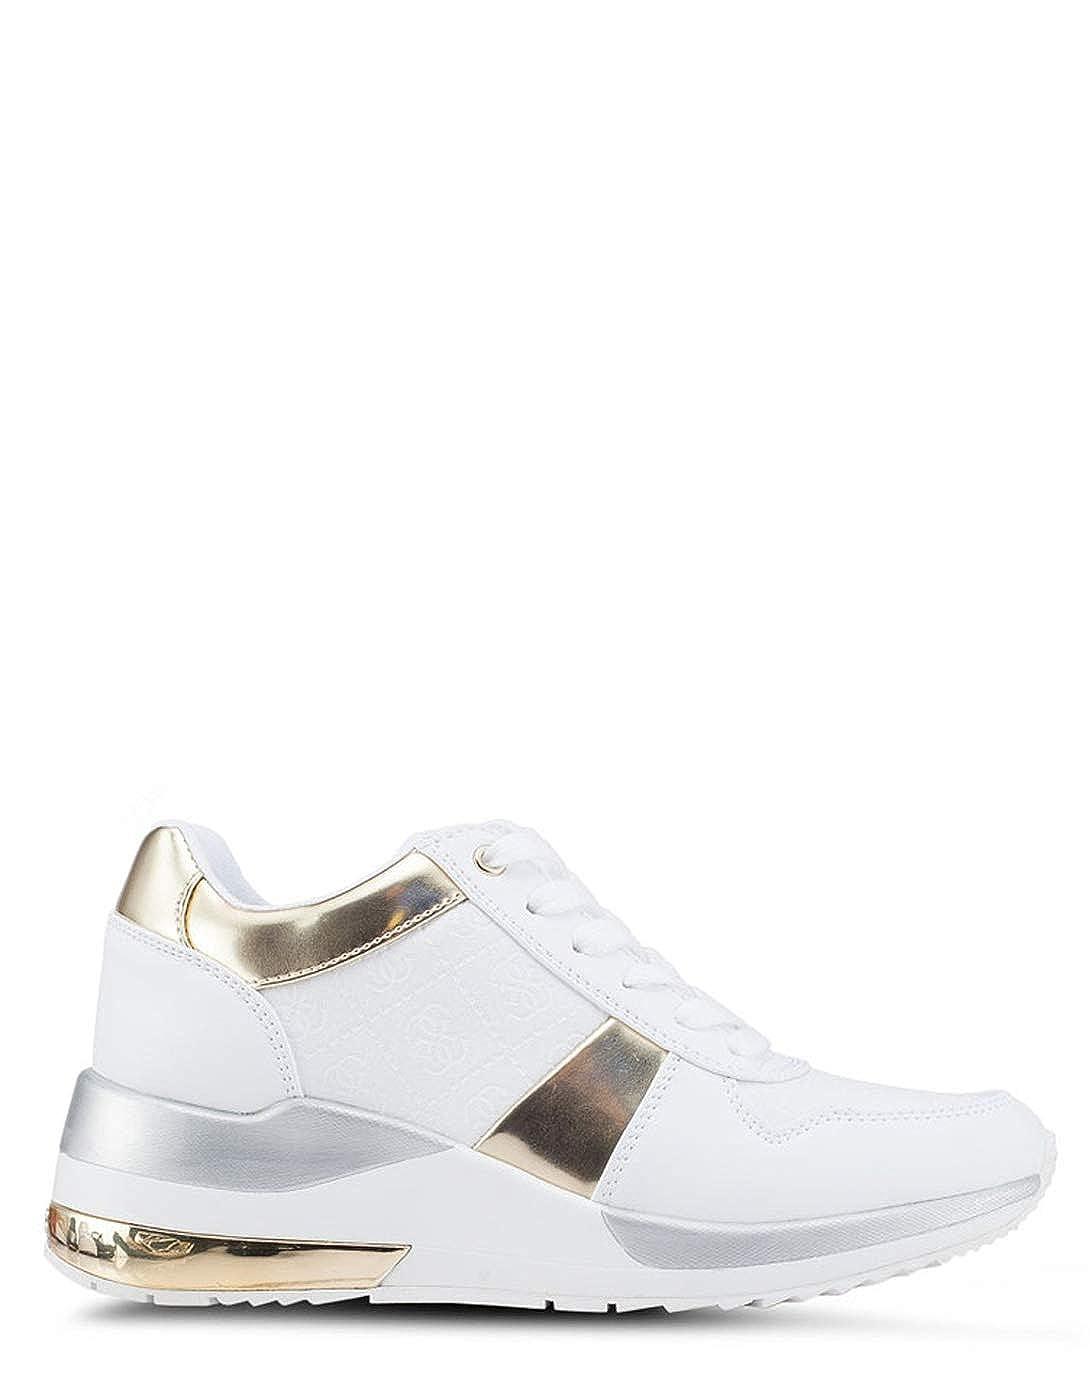 Guess Weiß Sneakers Janett Weiß